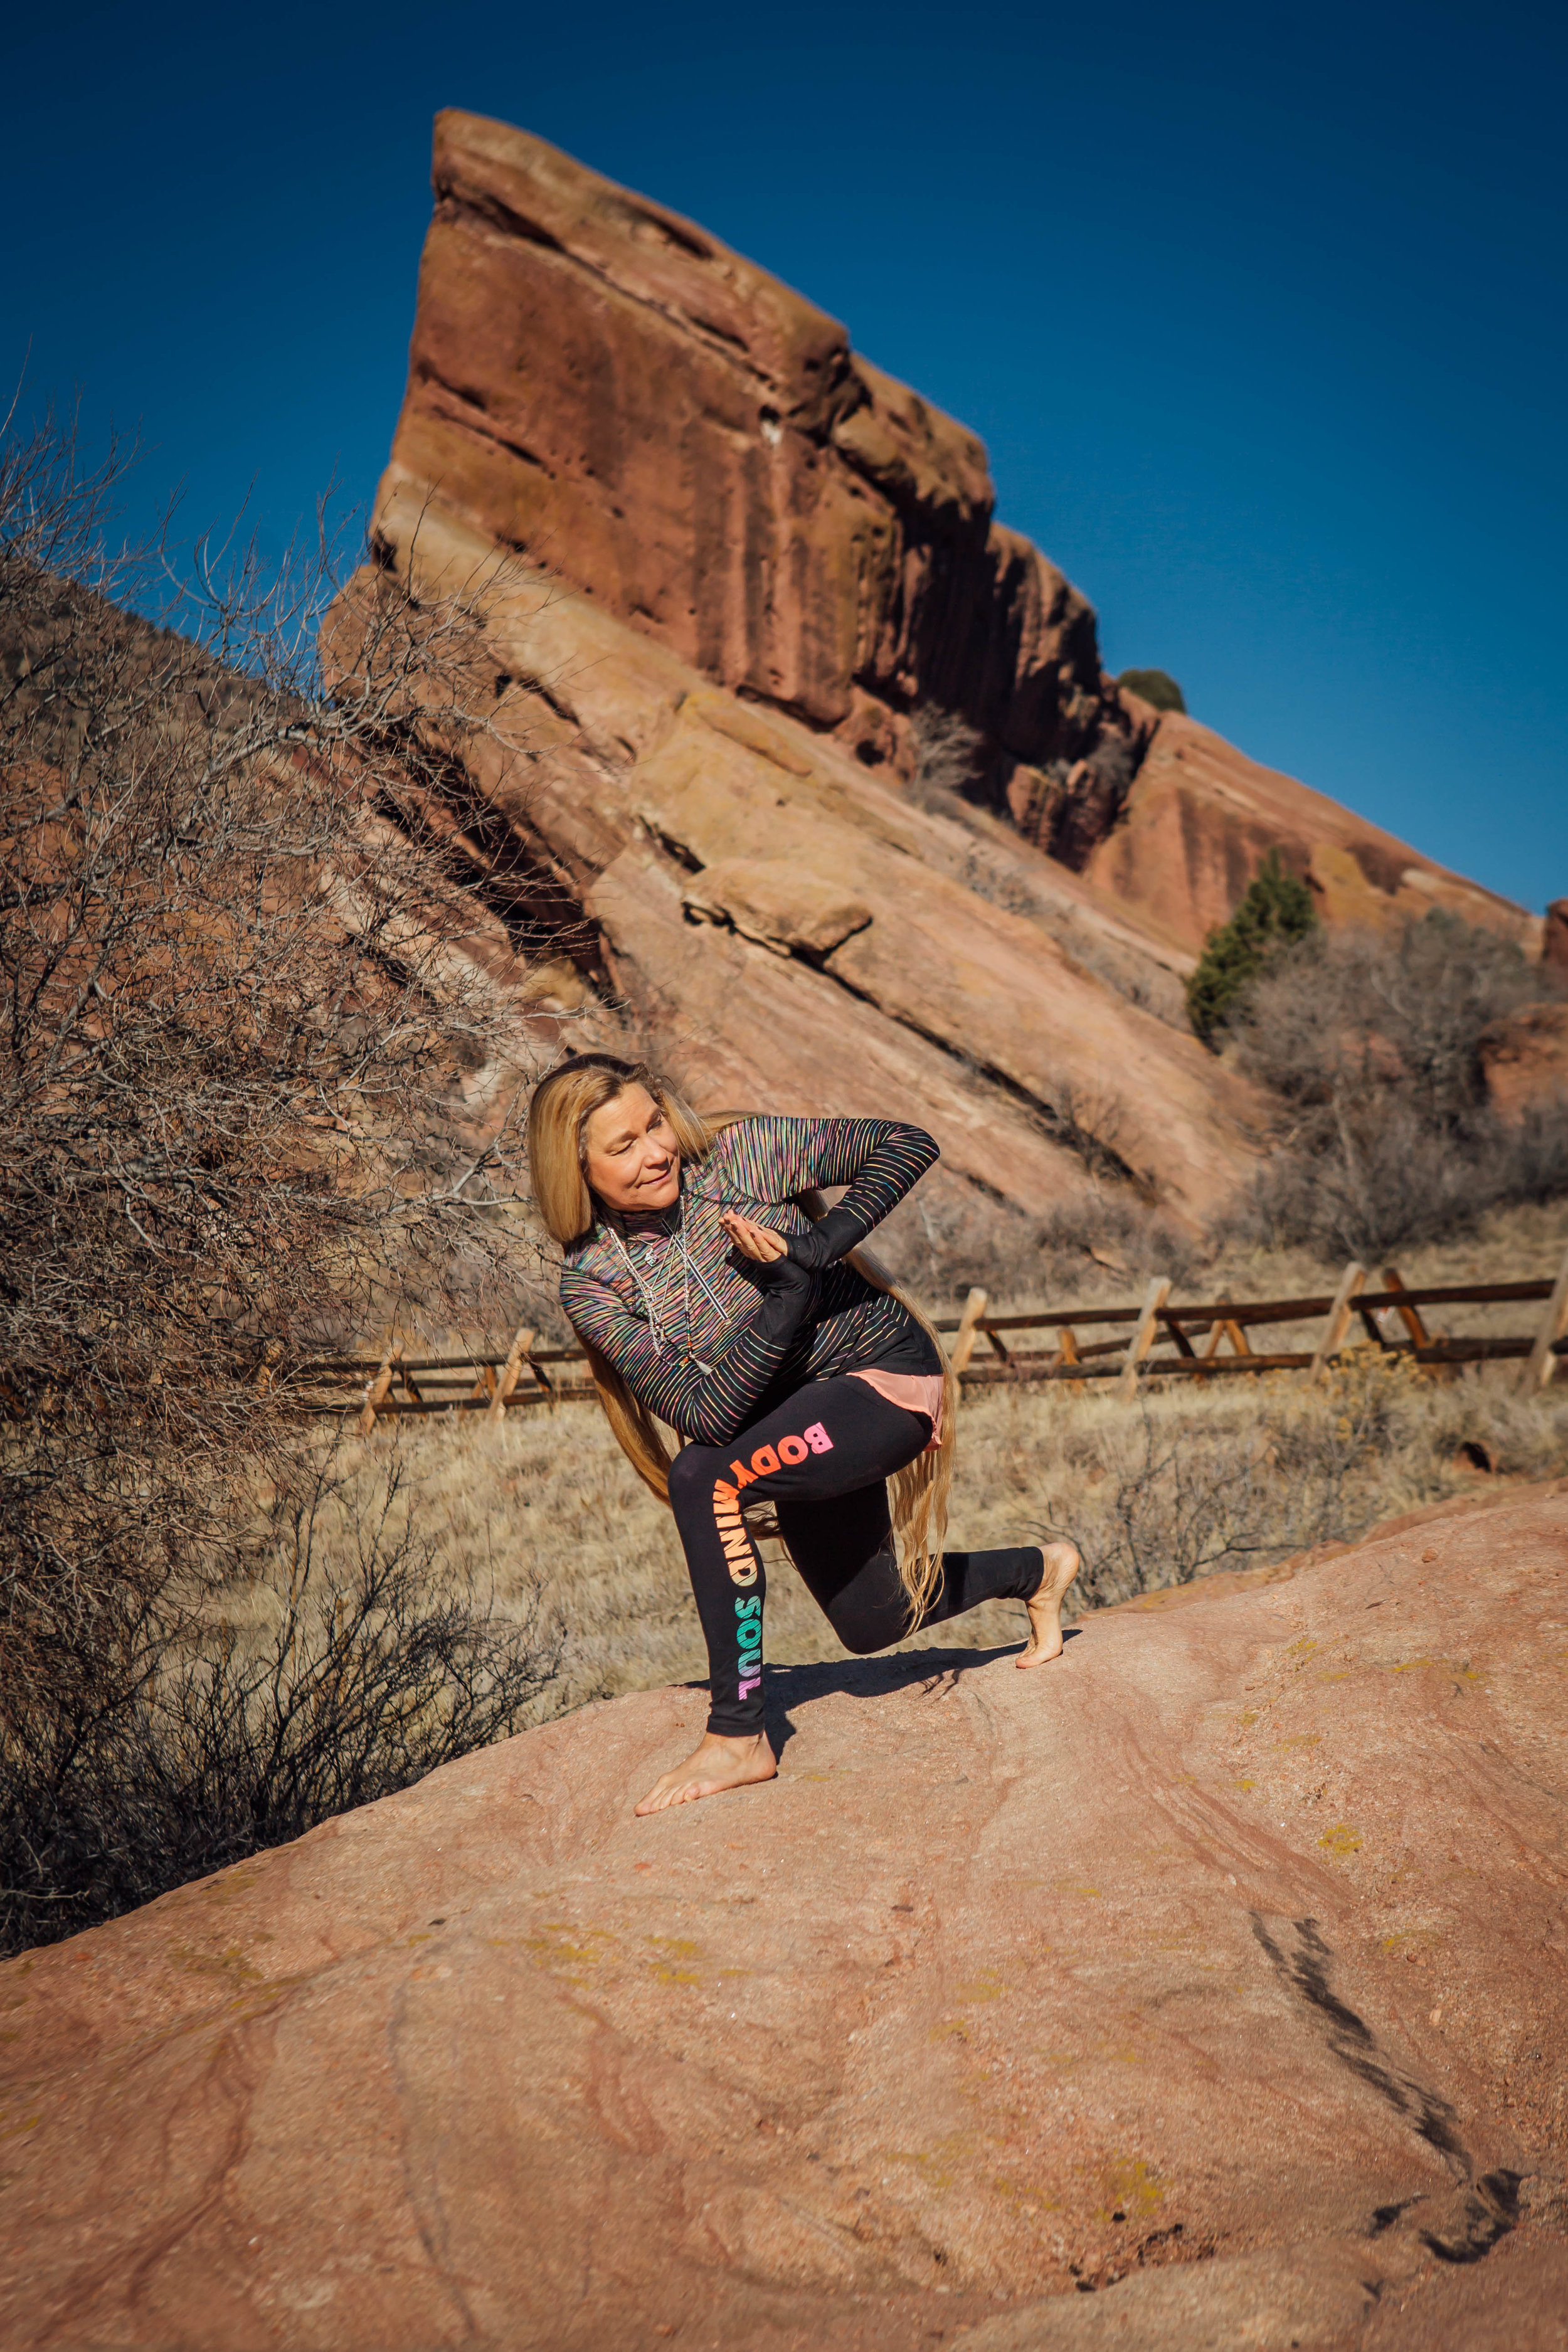 12082018_JanetSykora_Portrait_RedRocks_Colorado-7700.JPG